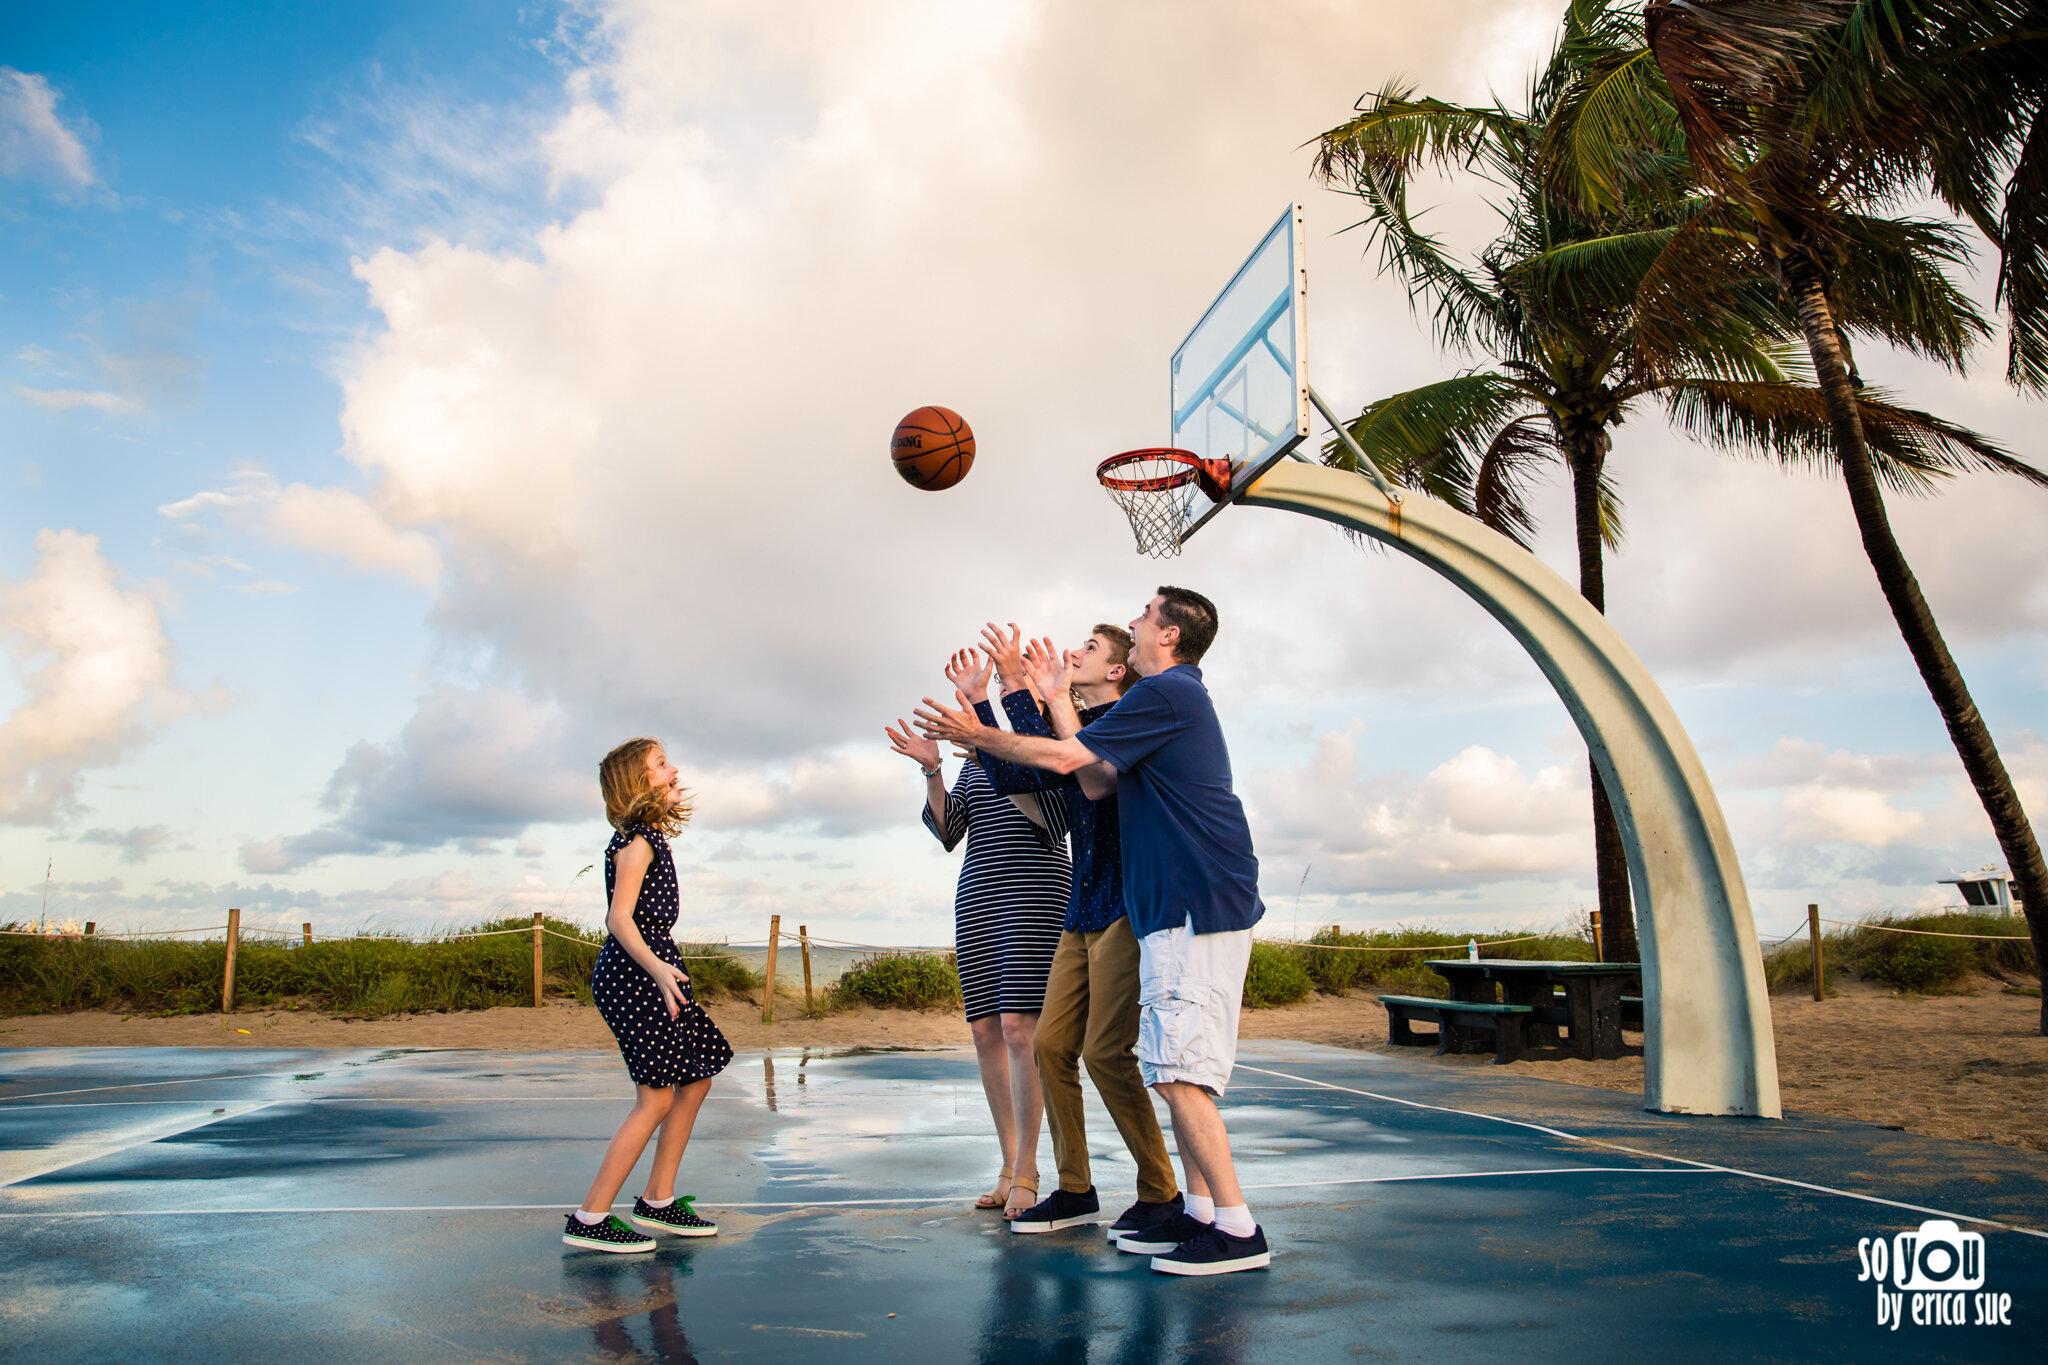 so-you-by-erica-sue-ft-lauderdale-beach-basketball-mitzvah-pre-shoot-9615.JPG